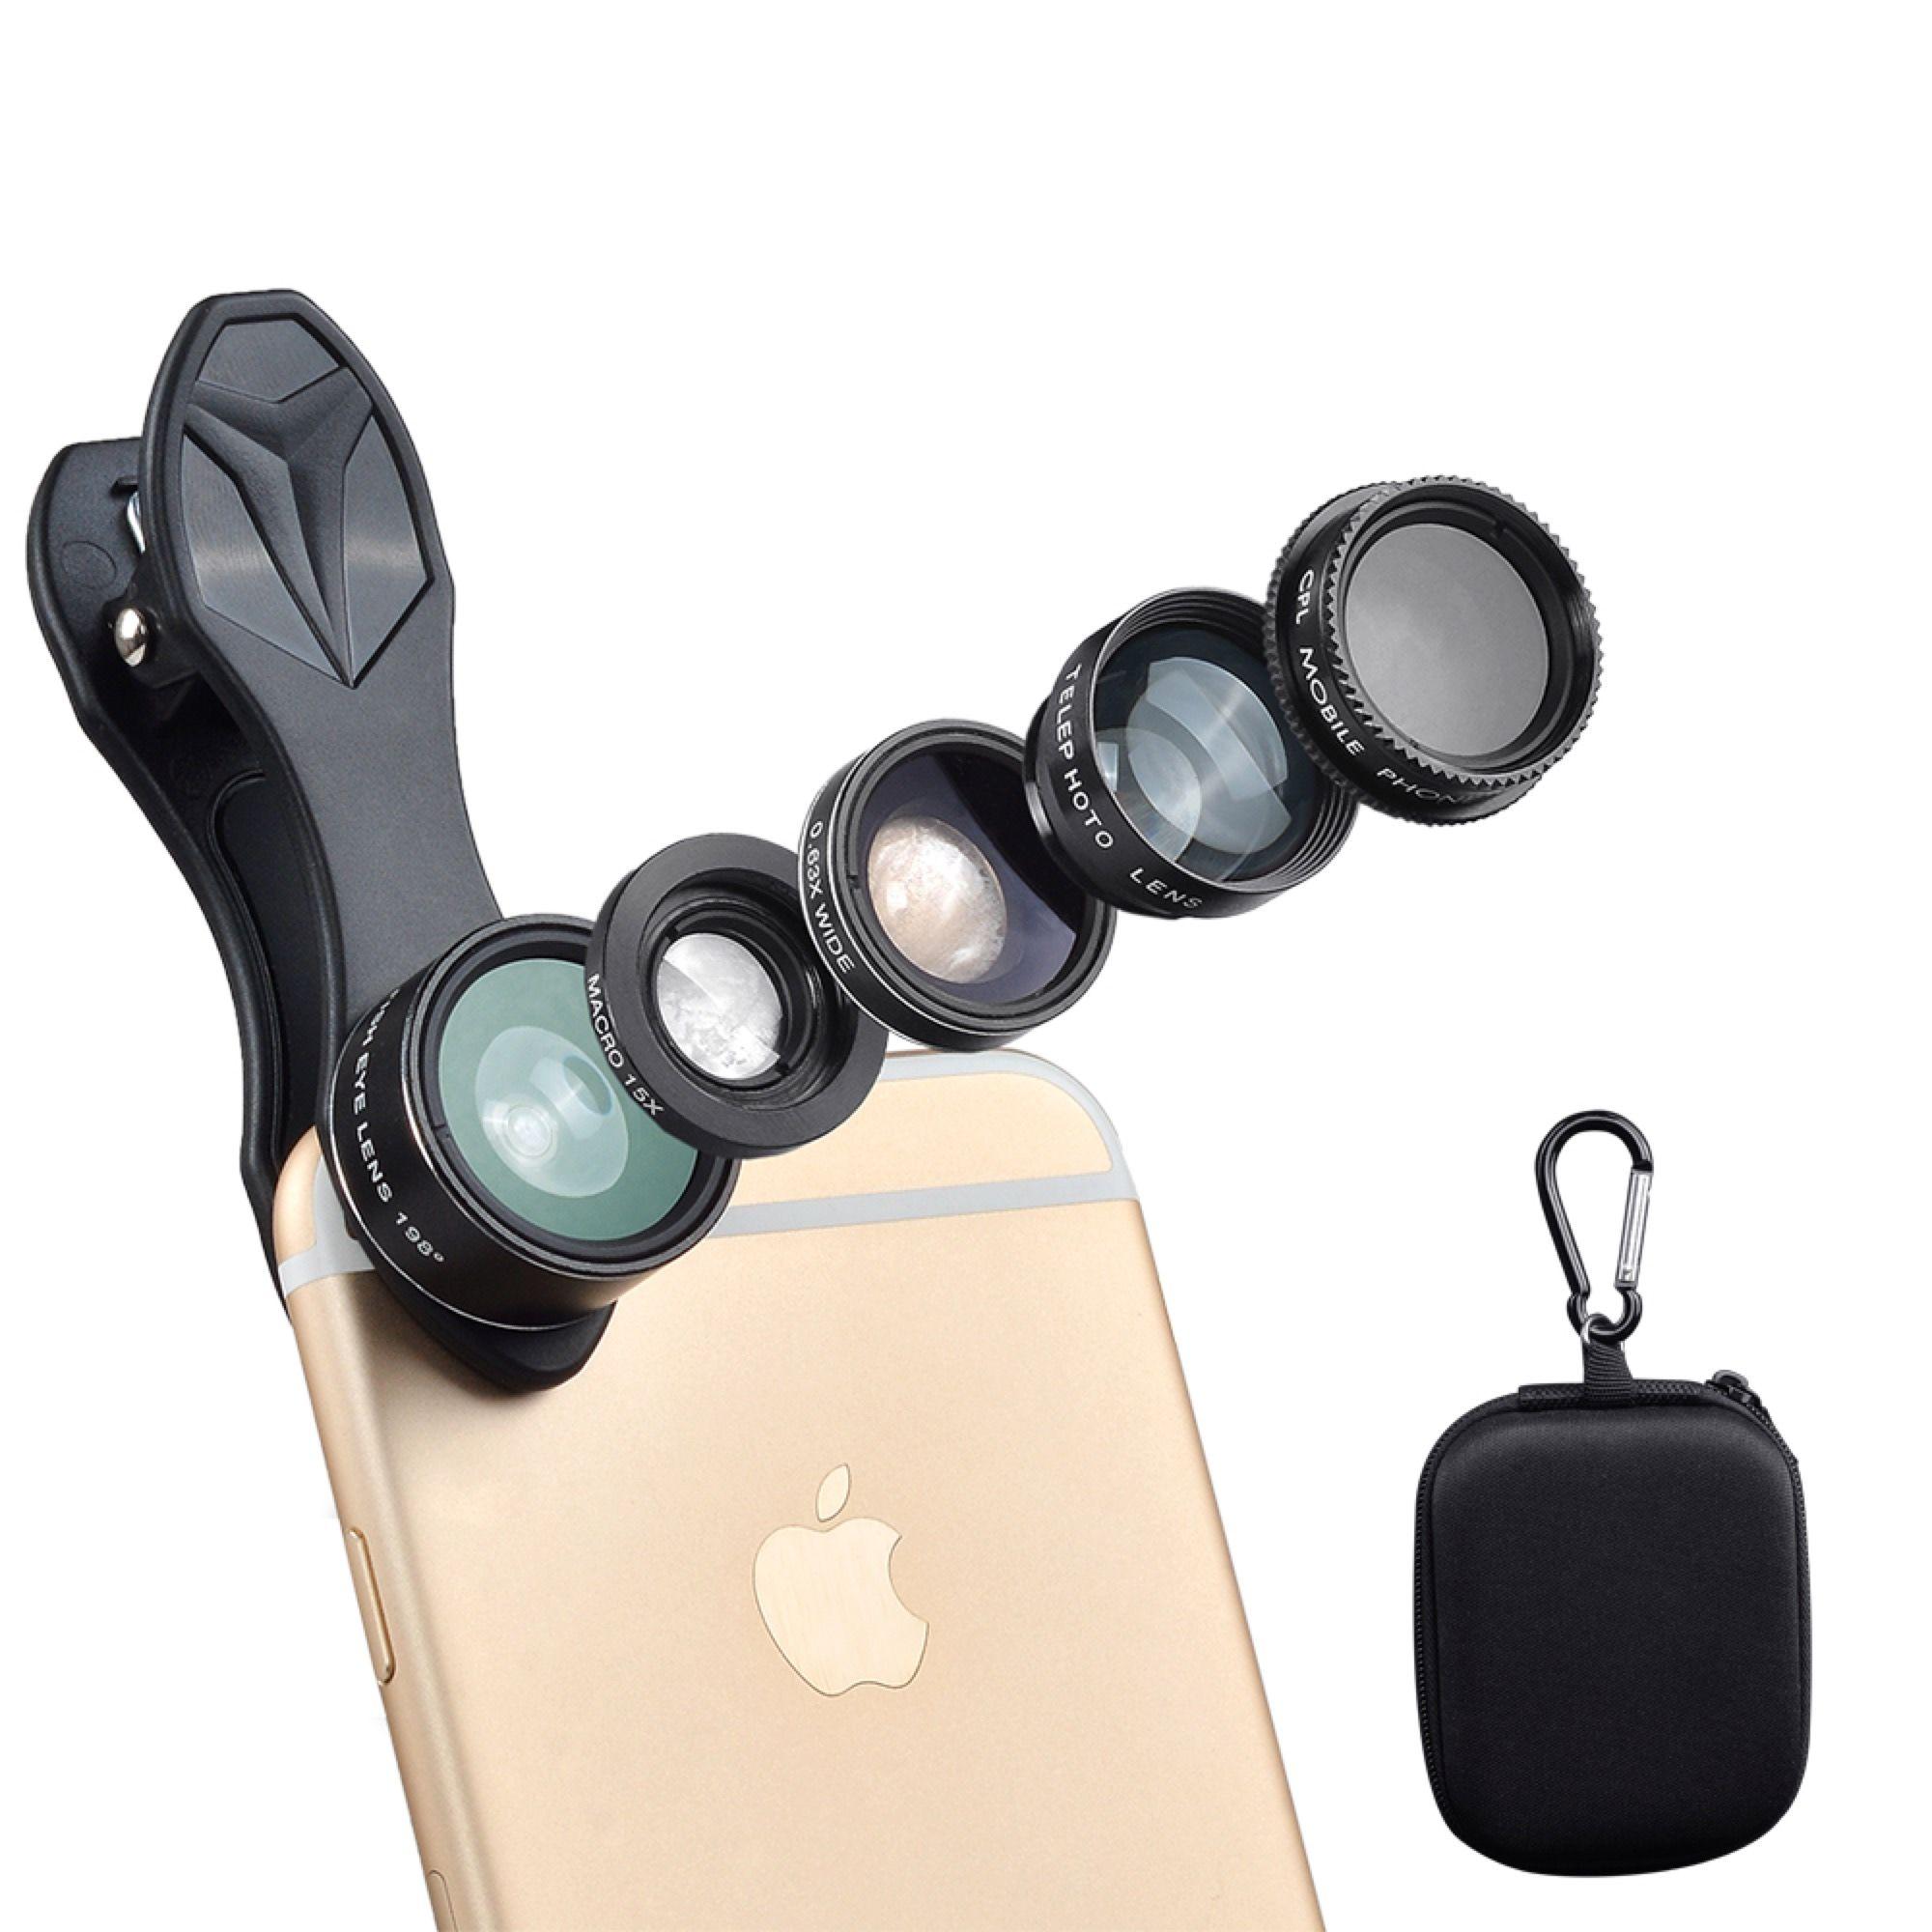 HDlens Iphone lens, Phone